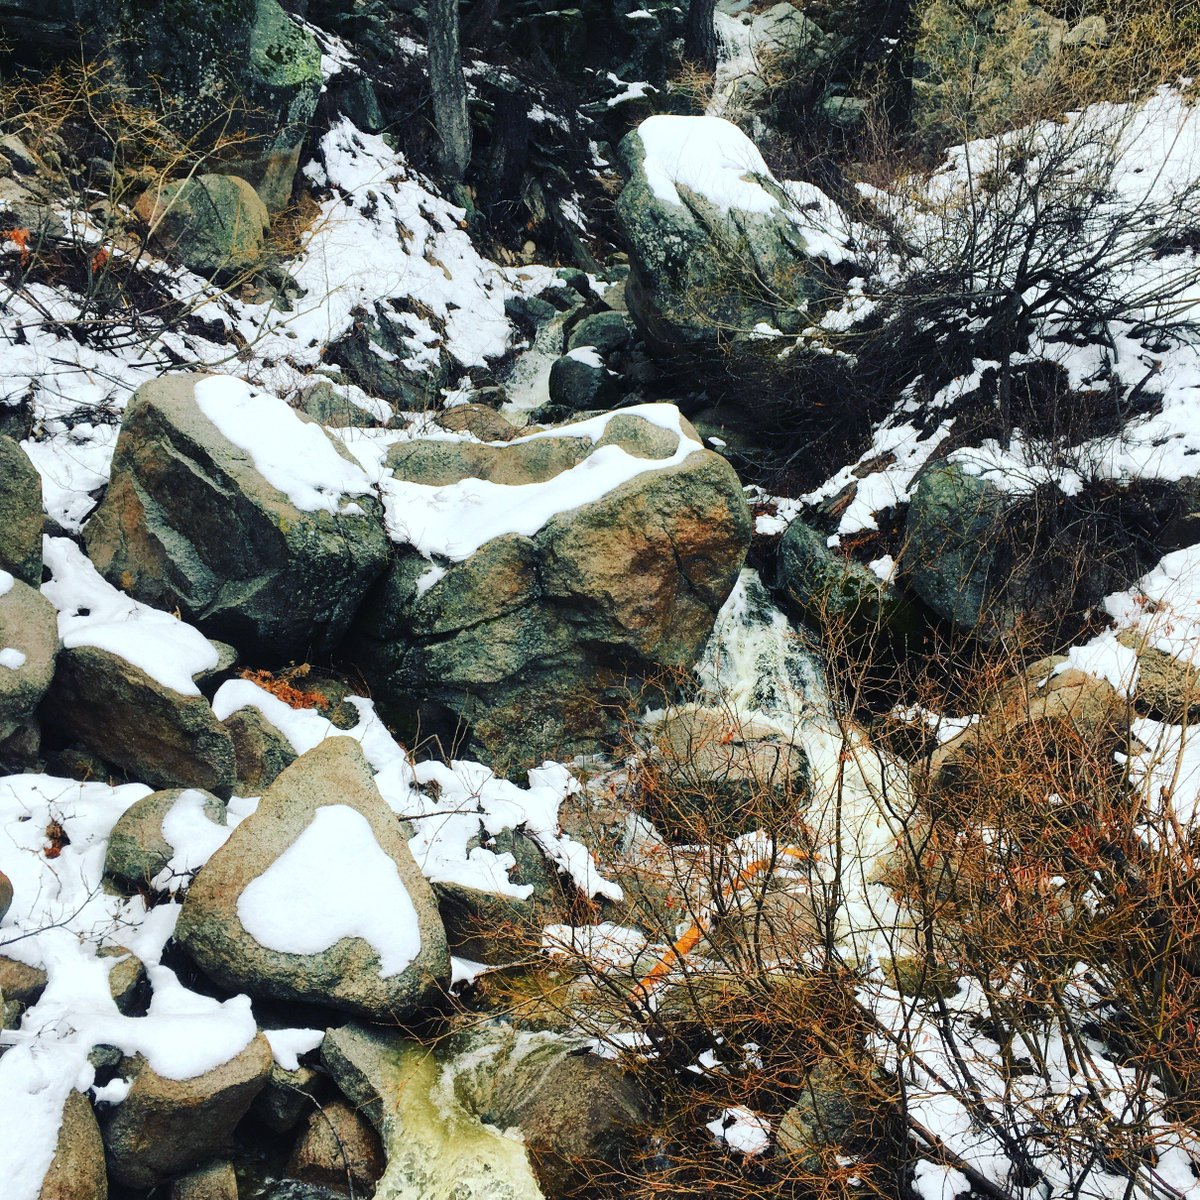 Caltrans District 8 على تويتر Waterfall Castle Rock Hiking Trail